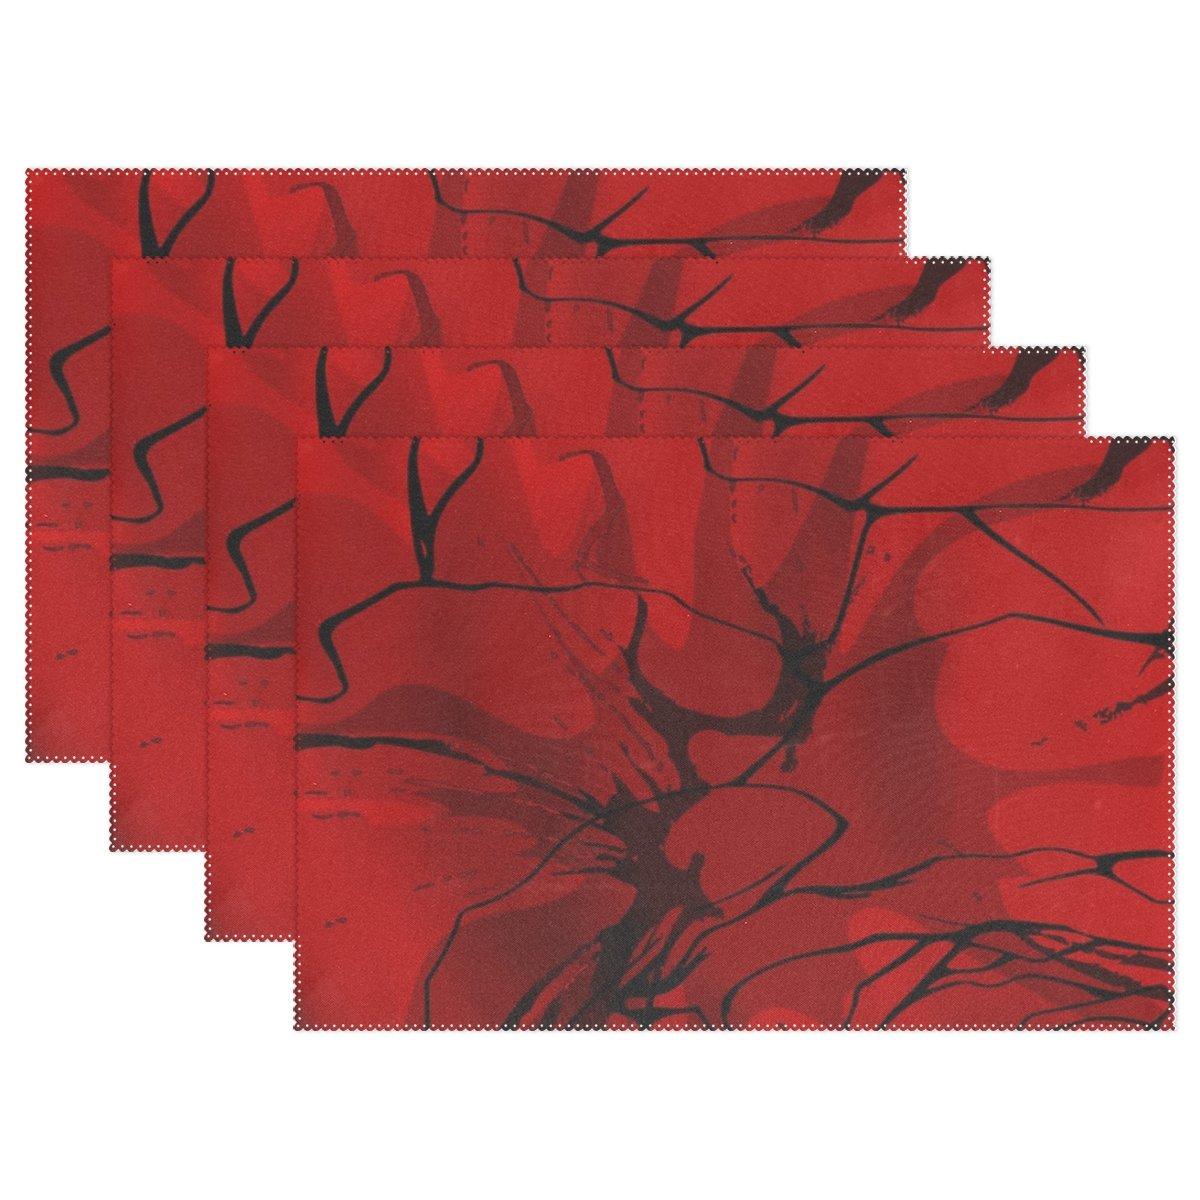 enevotxレッド抽象レッドテクスチャPlacemats Set of 4熱断熱材Stain Resistant forダイニングテーブル耐久性ノンスリップキッチンテーブルPlaceマット   B07FNJPJW2